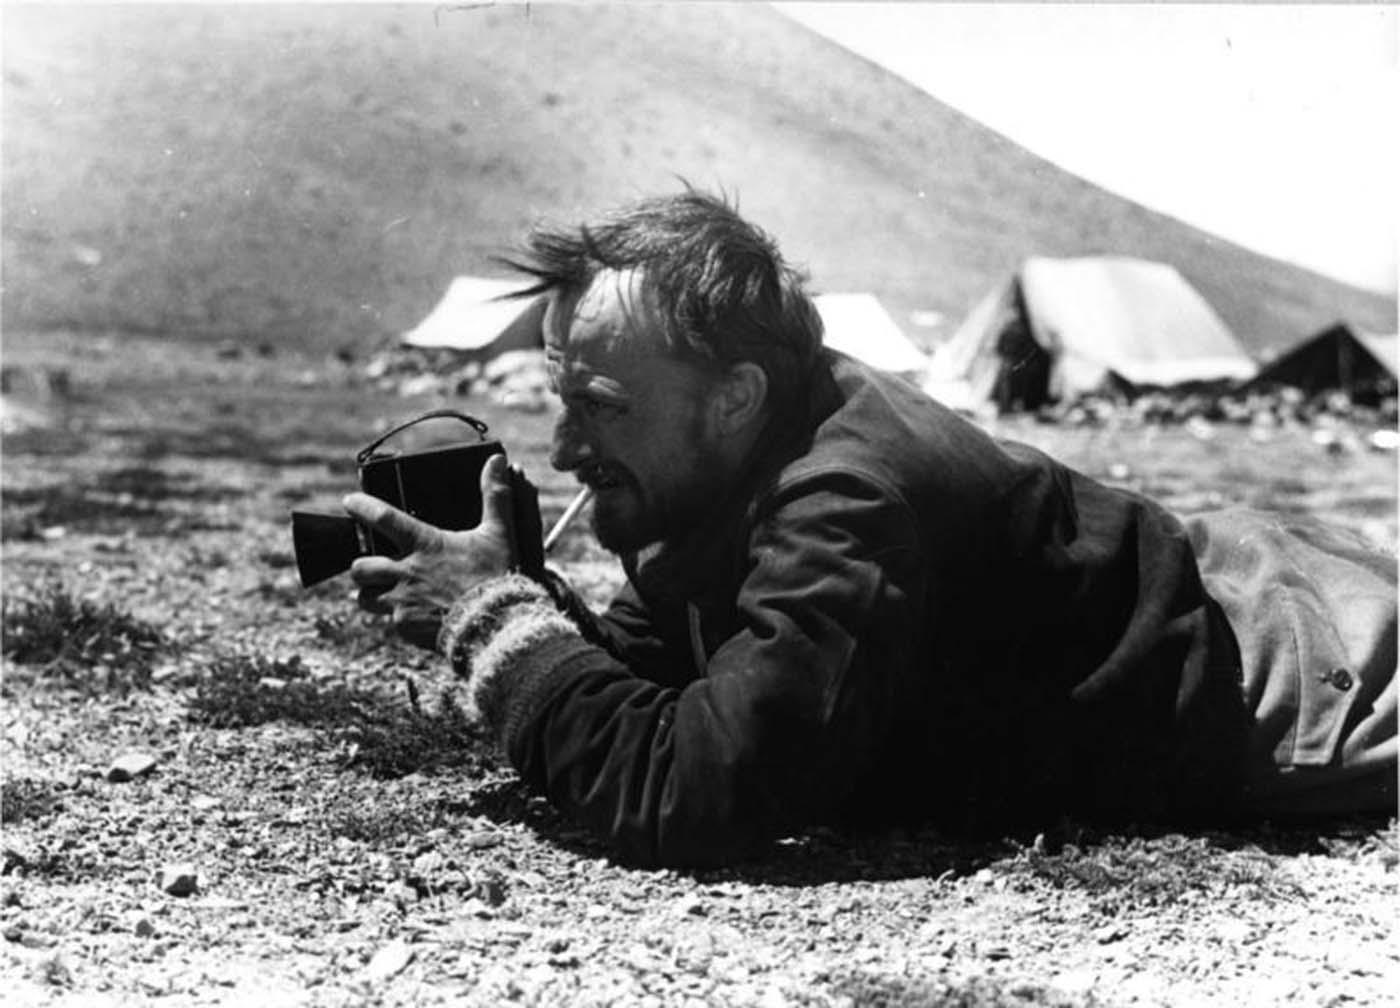 Ernst Krause filmando arveja azul.